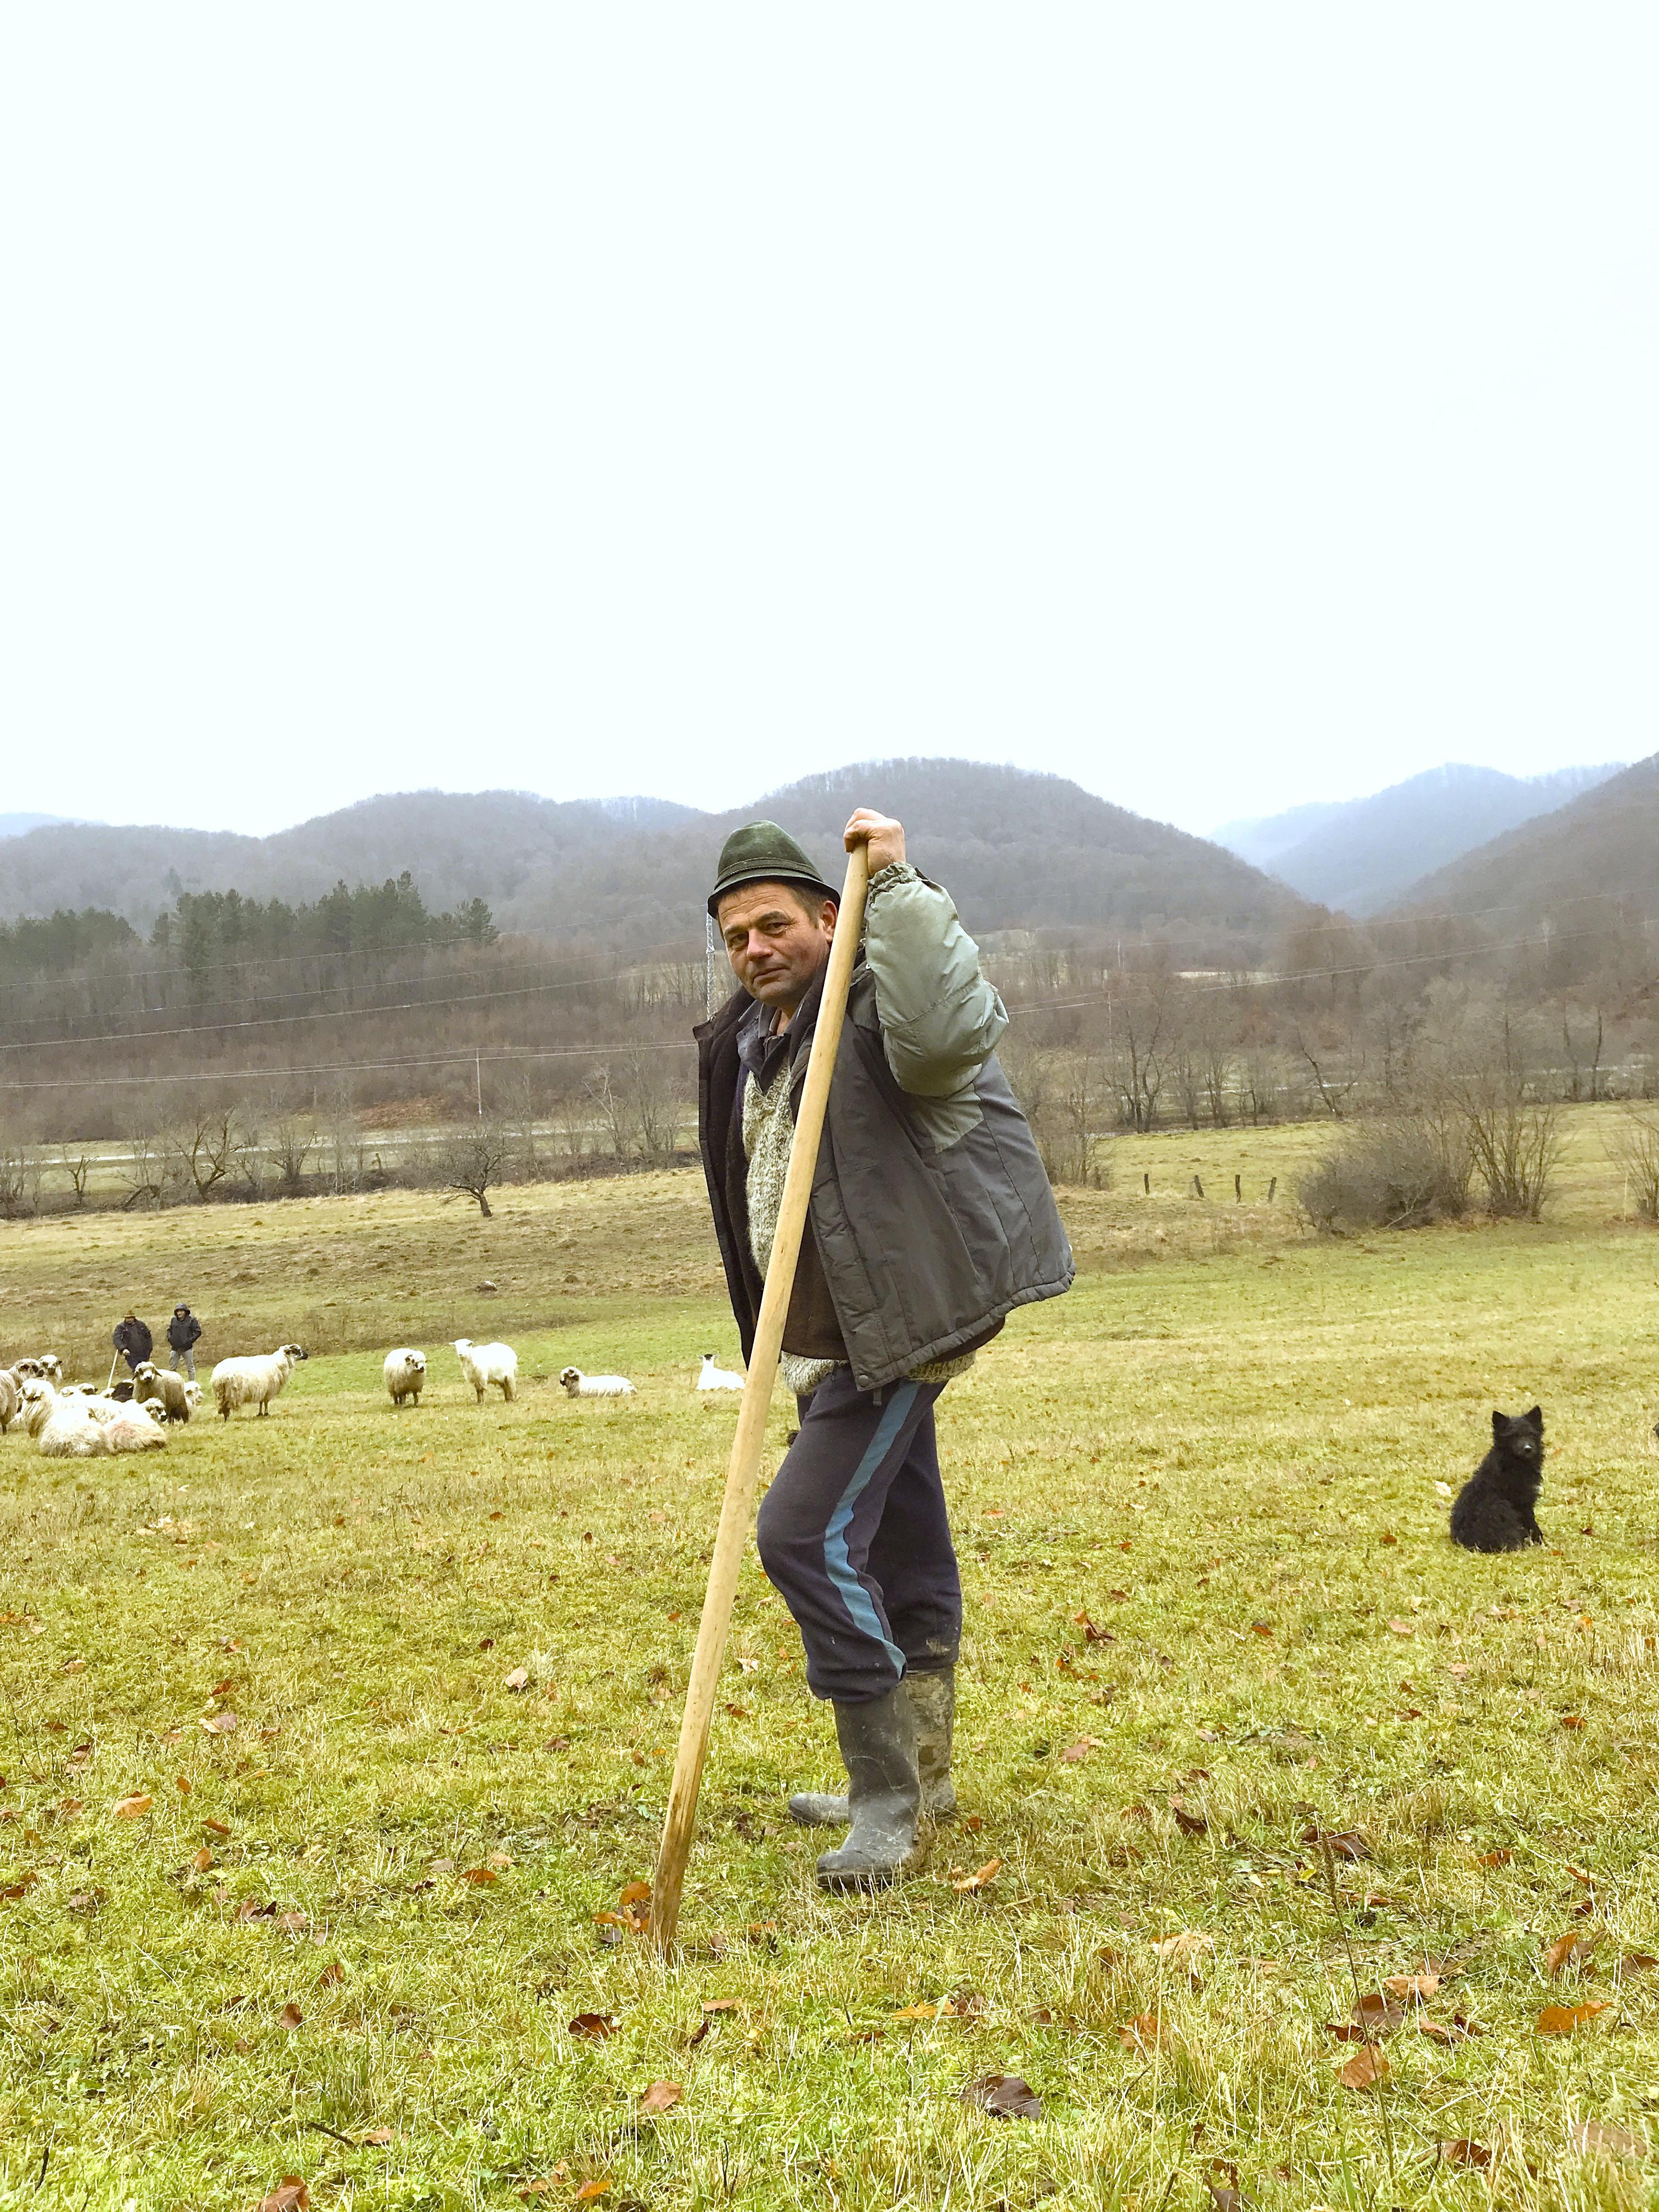 Pastor Buda Ionel, Tara Lapusului, Romania, Transylvania